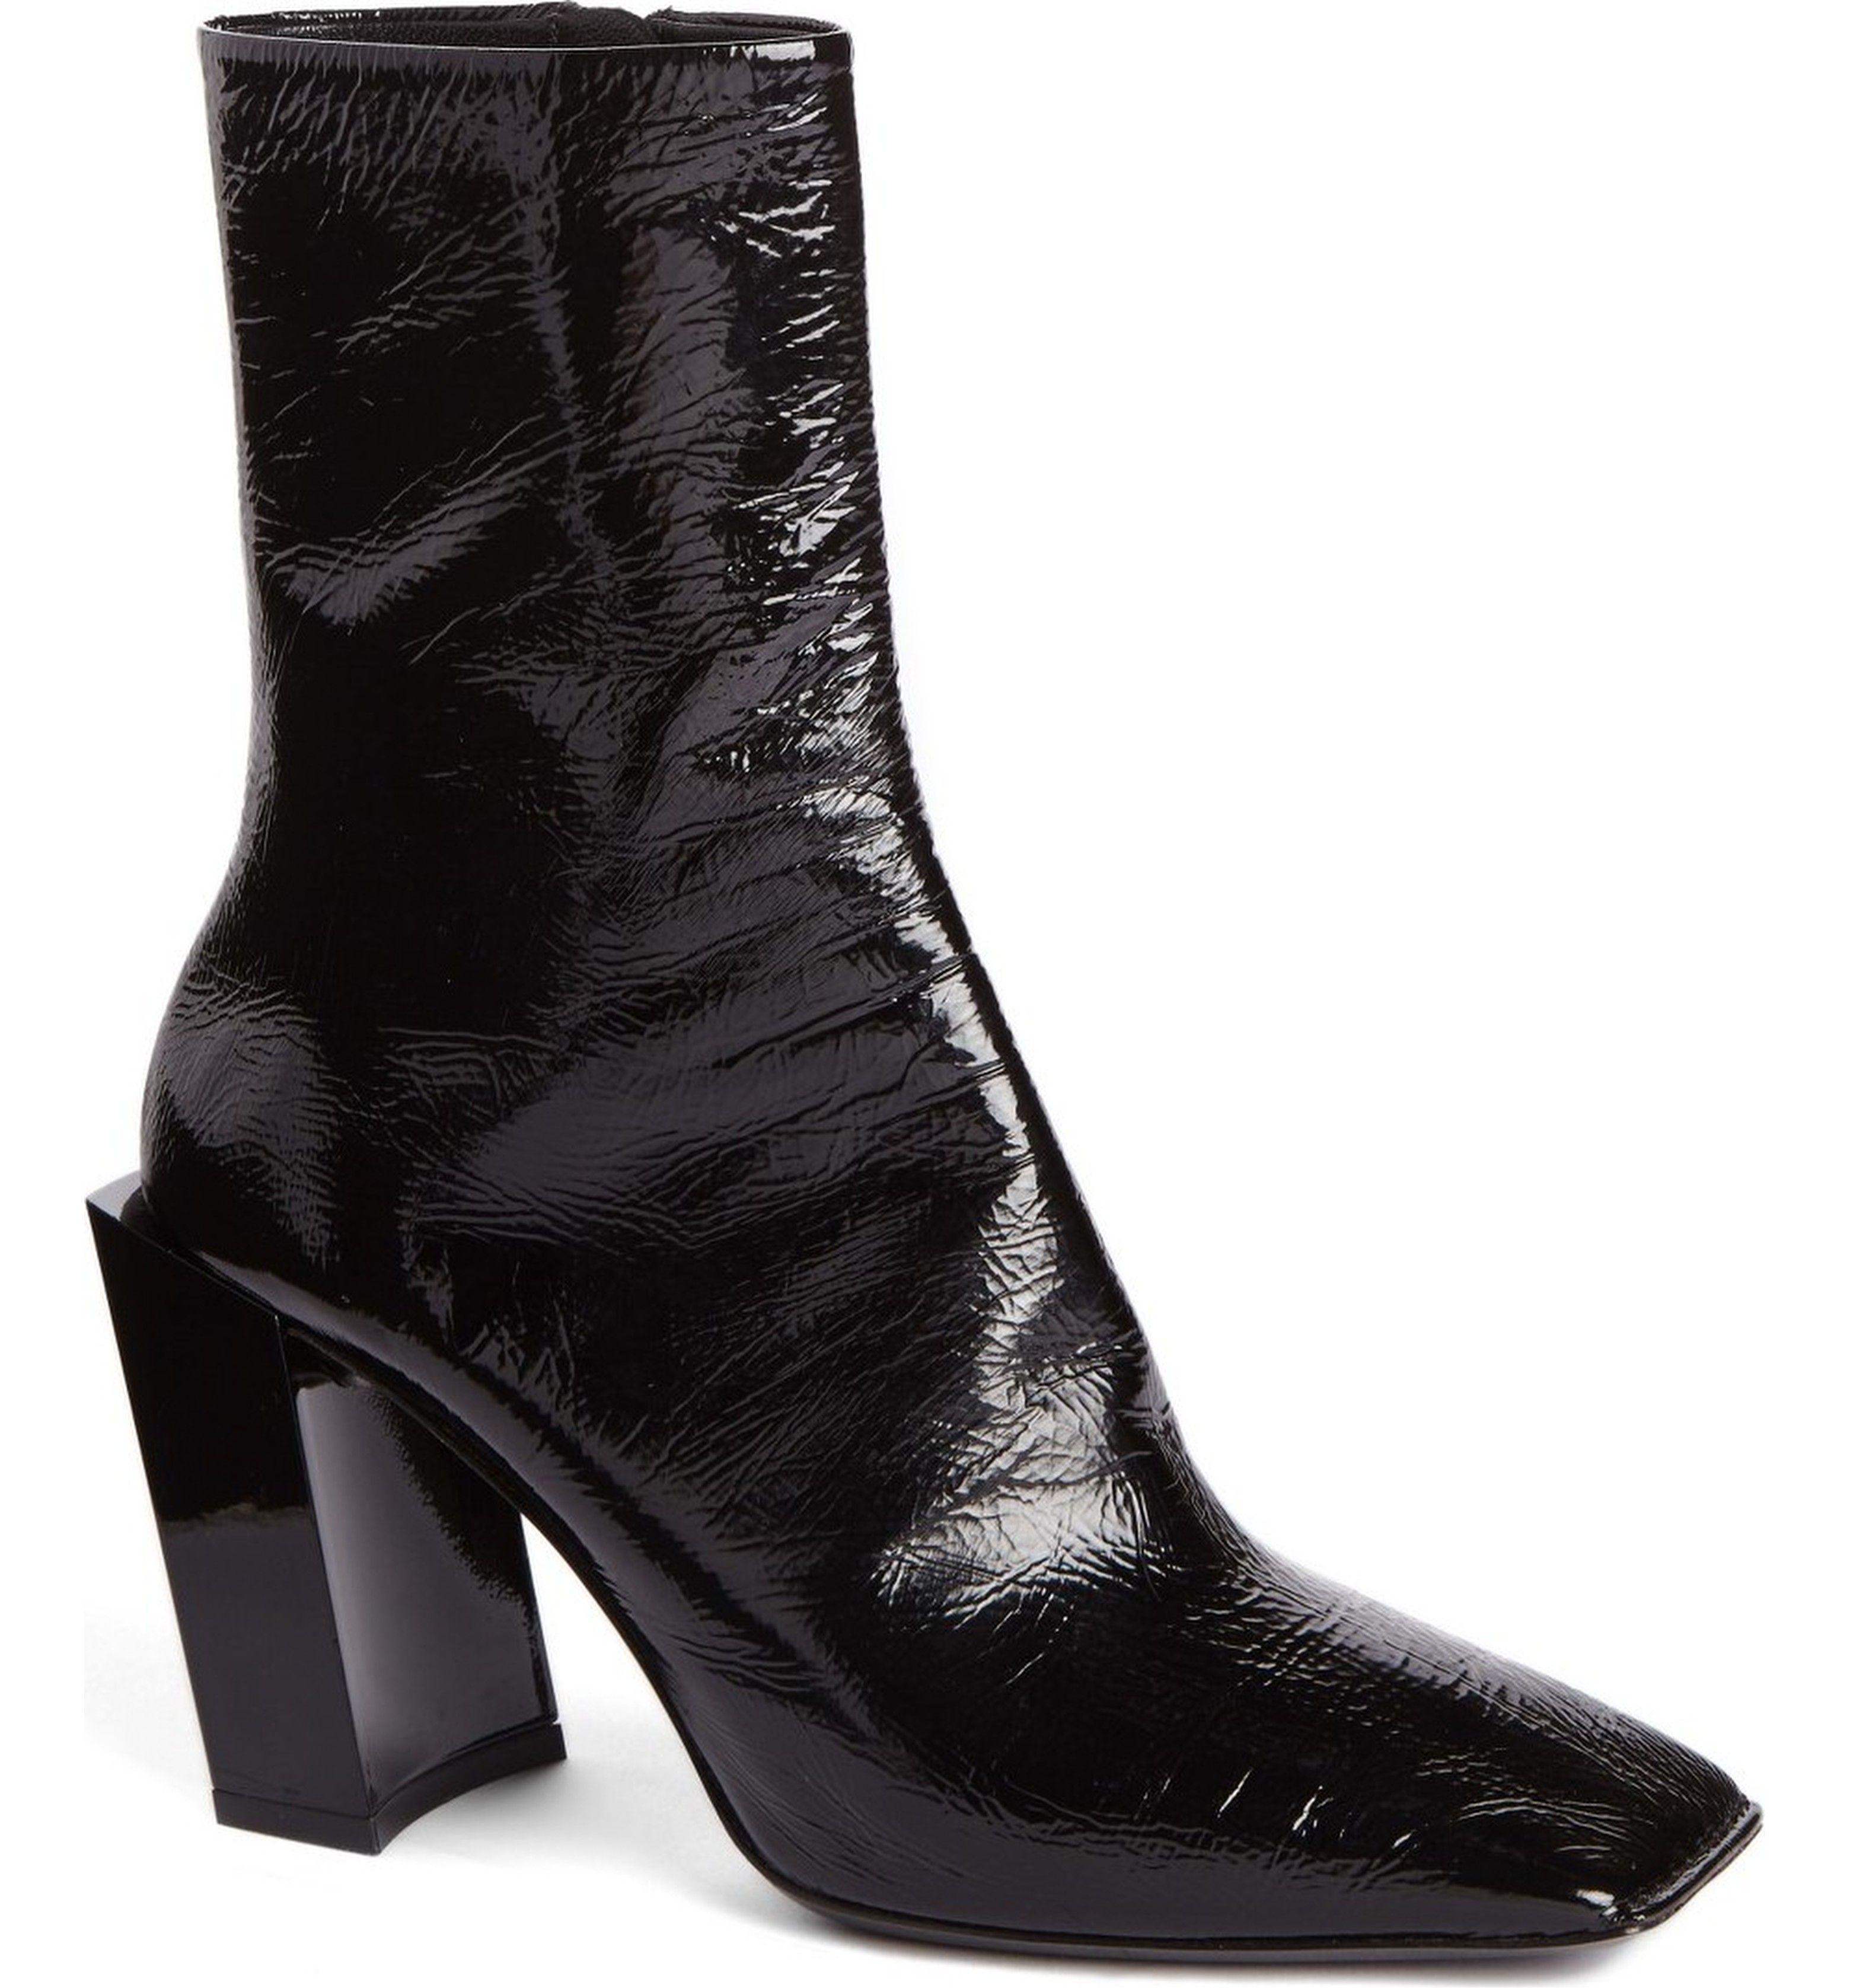 Balenciaga Square Toe Boot (Women